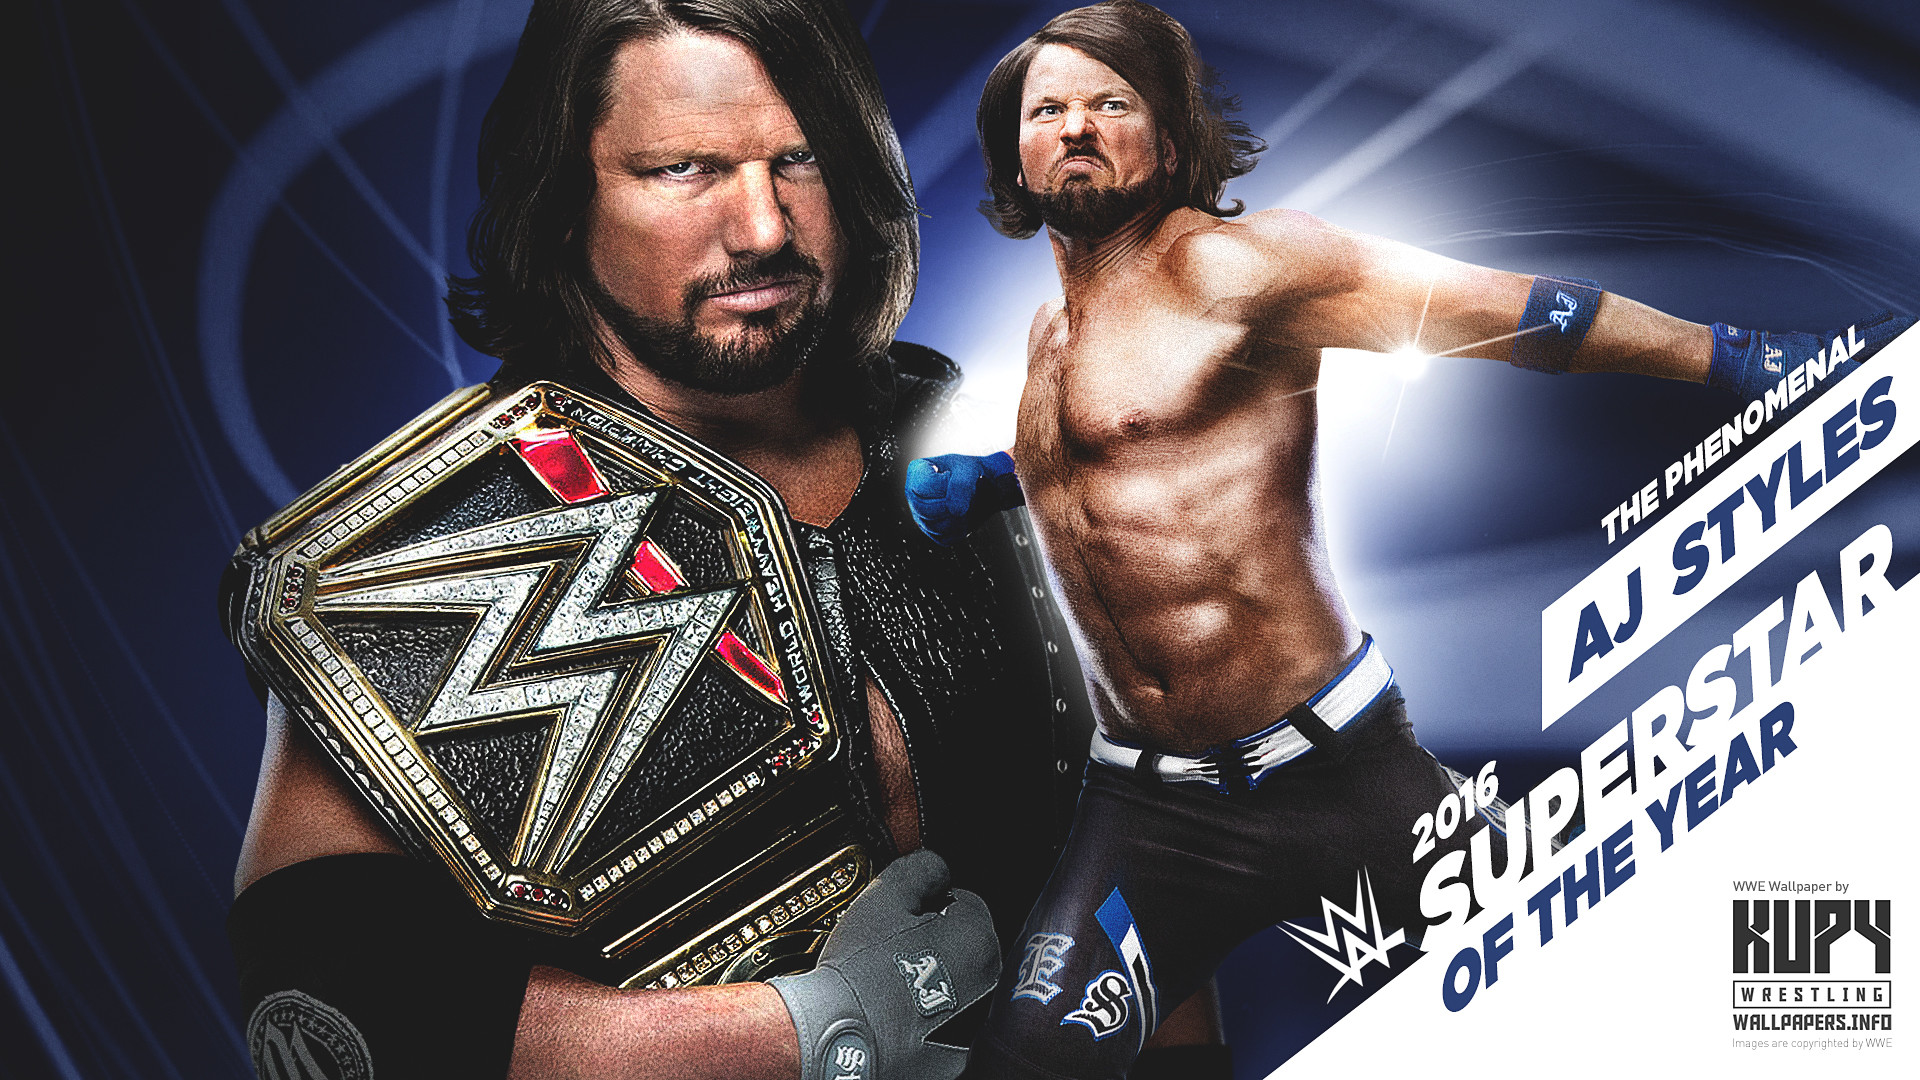 Wwe Raw Superstars 2018 Wallpaper 67 Images